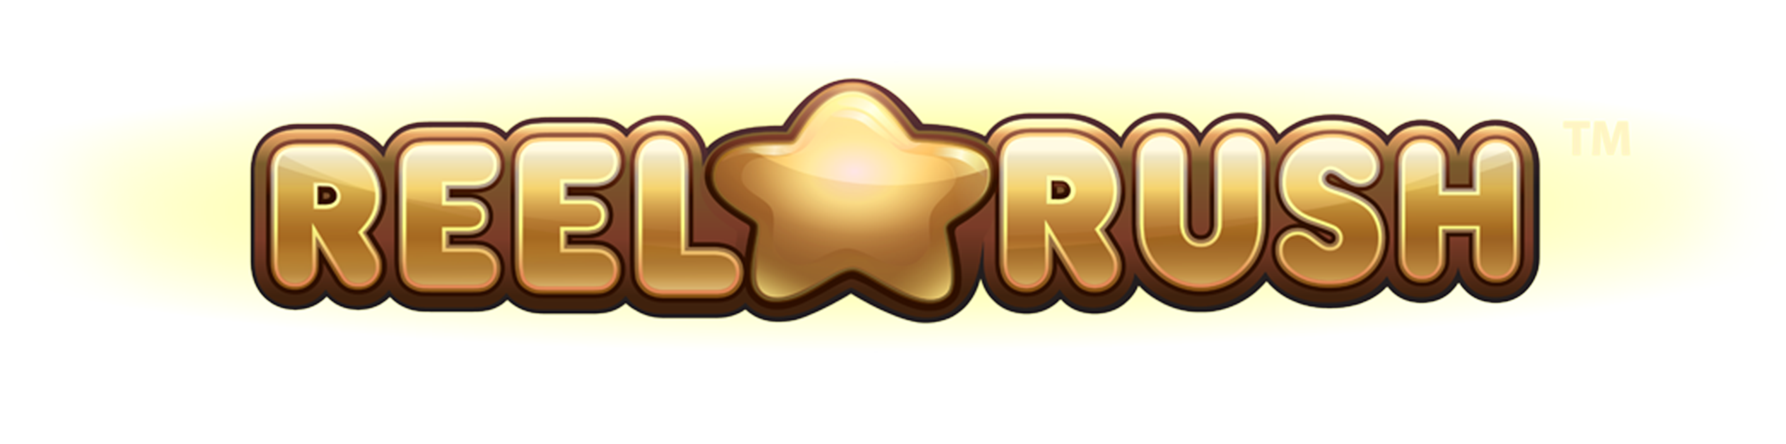 Reel-Rush_logo